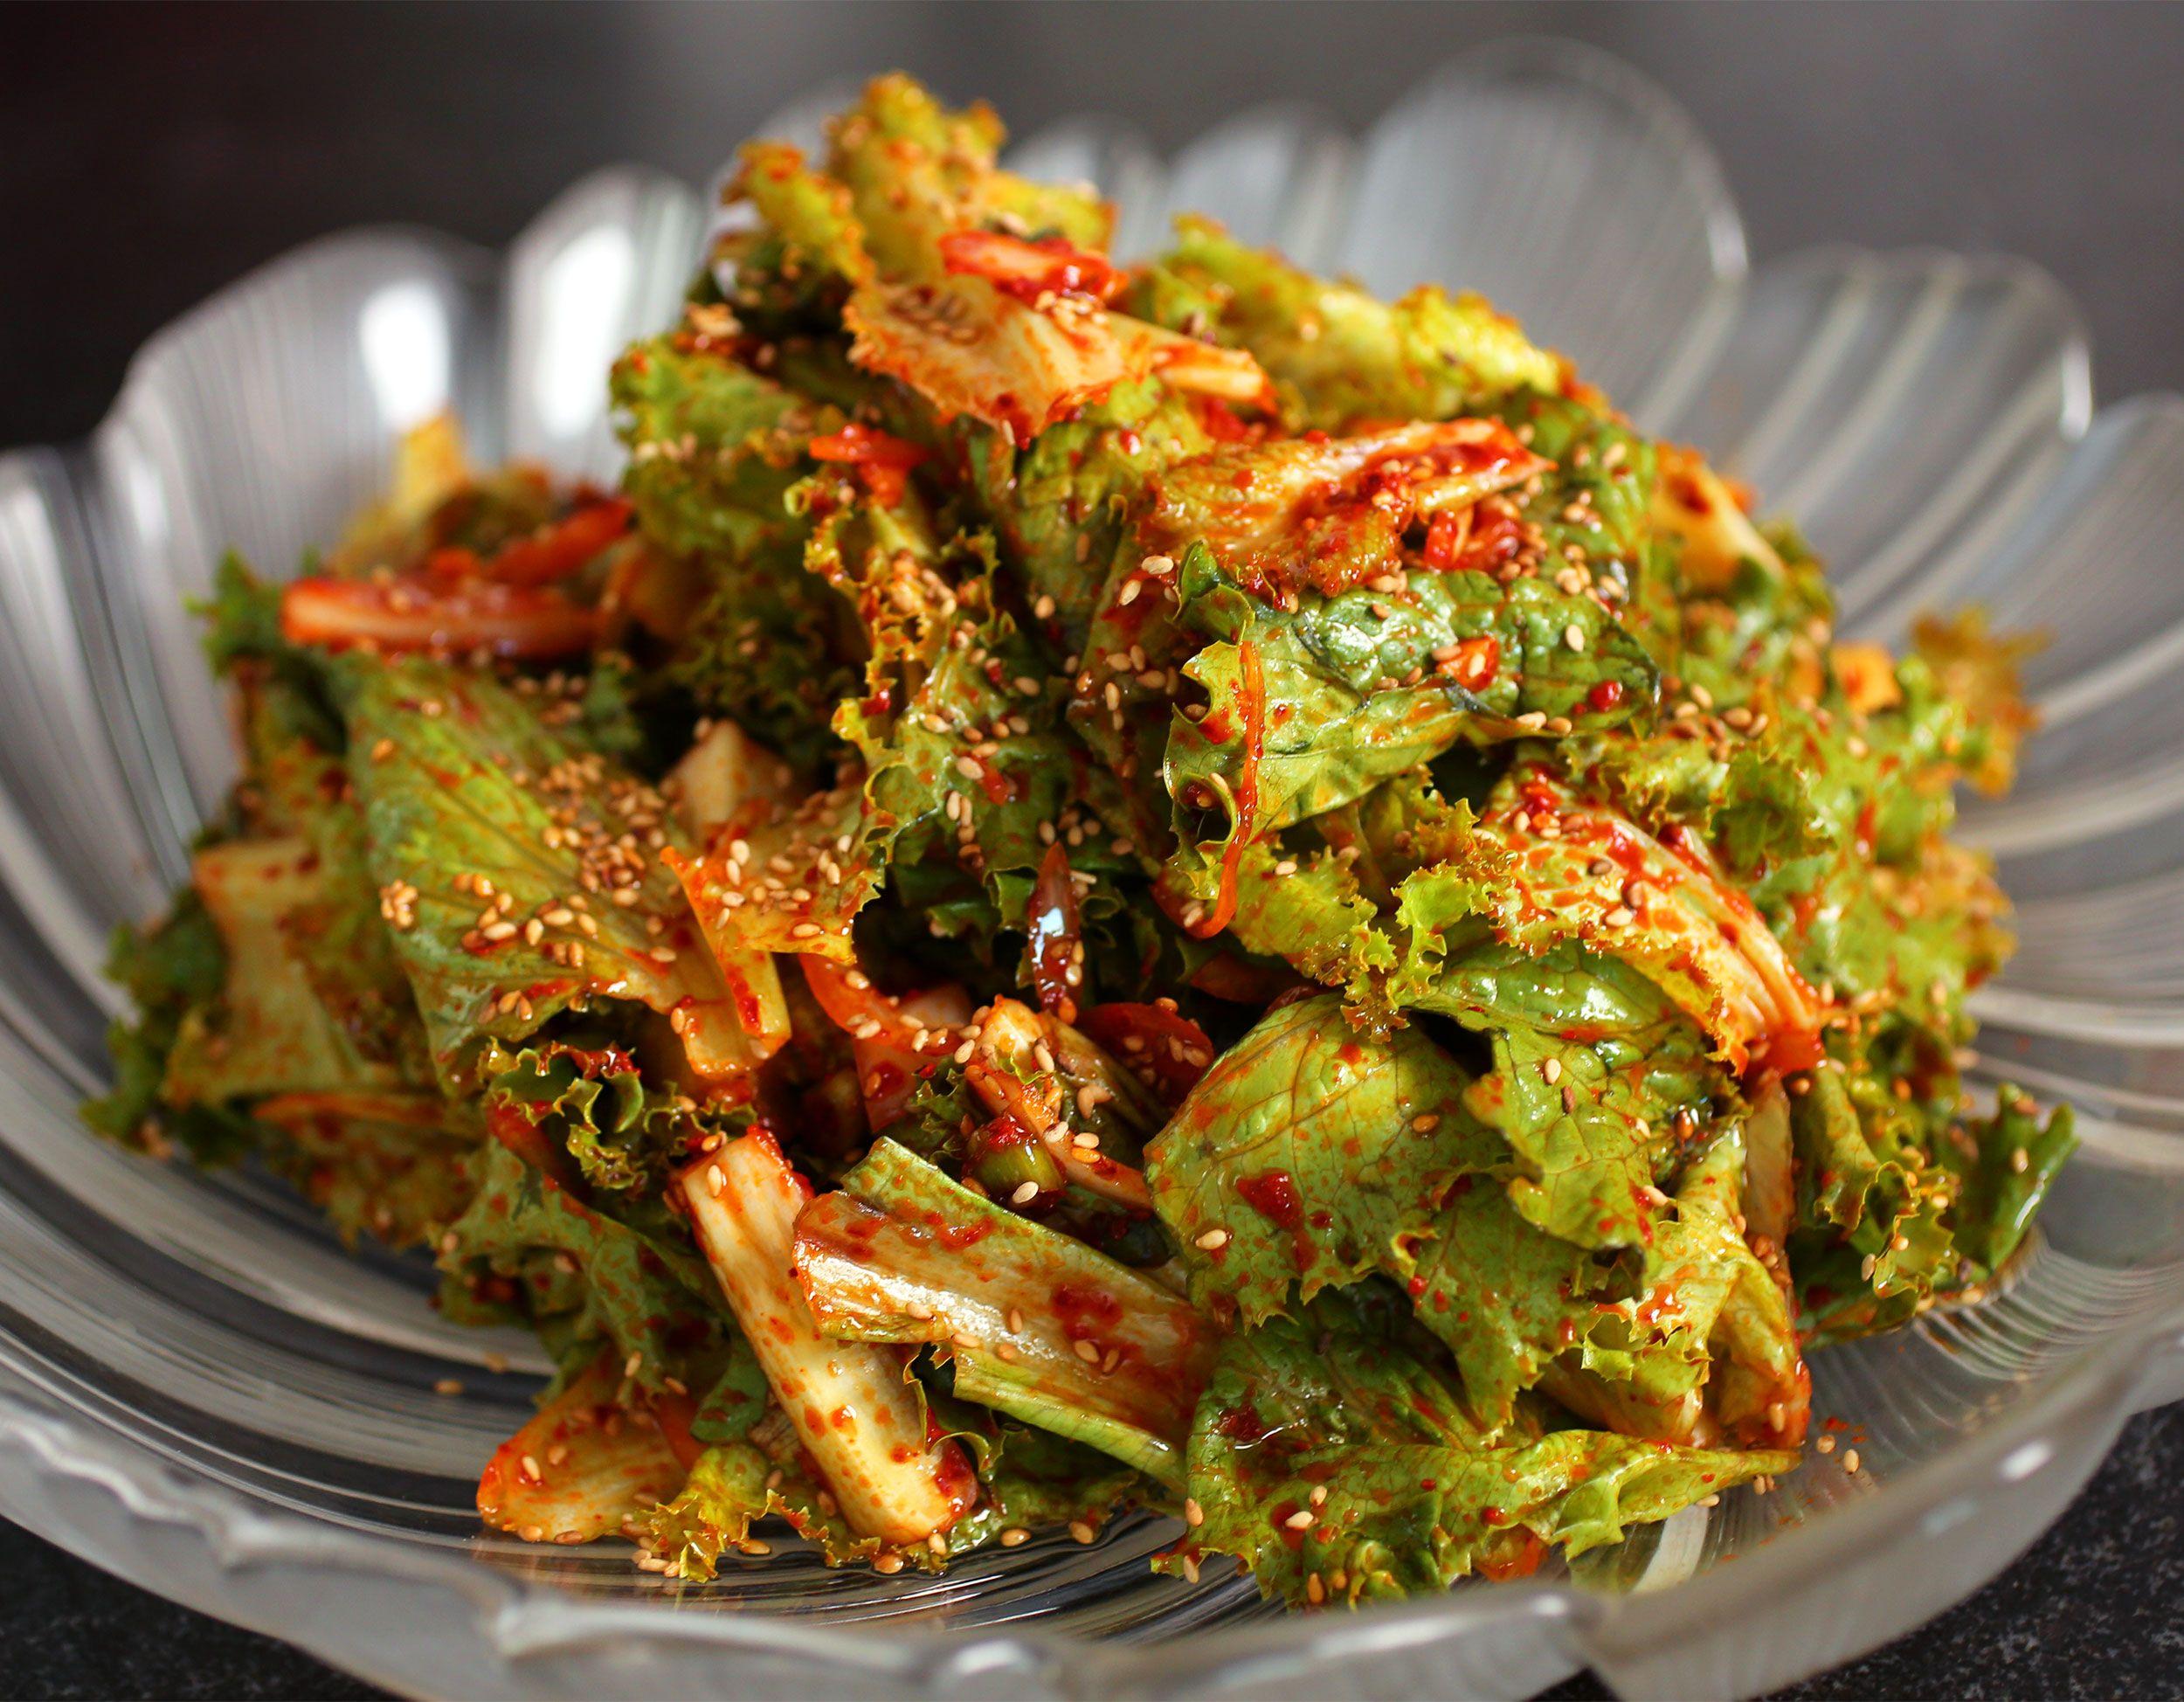 Sangchu Geotjeori Recipe Salads Korean Salad Recipe